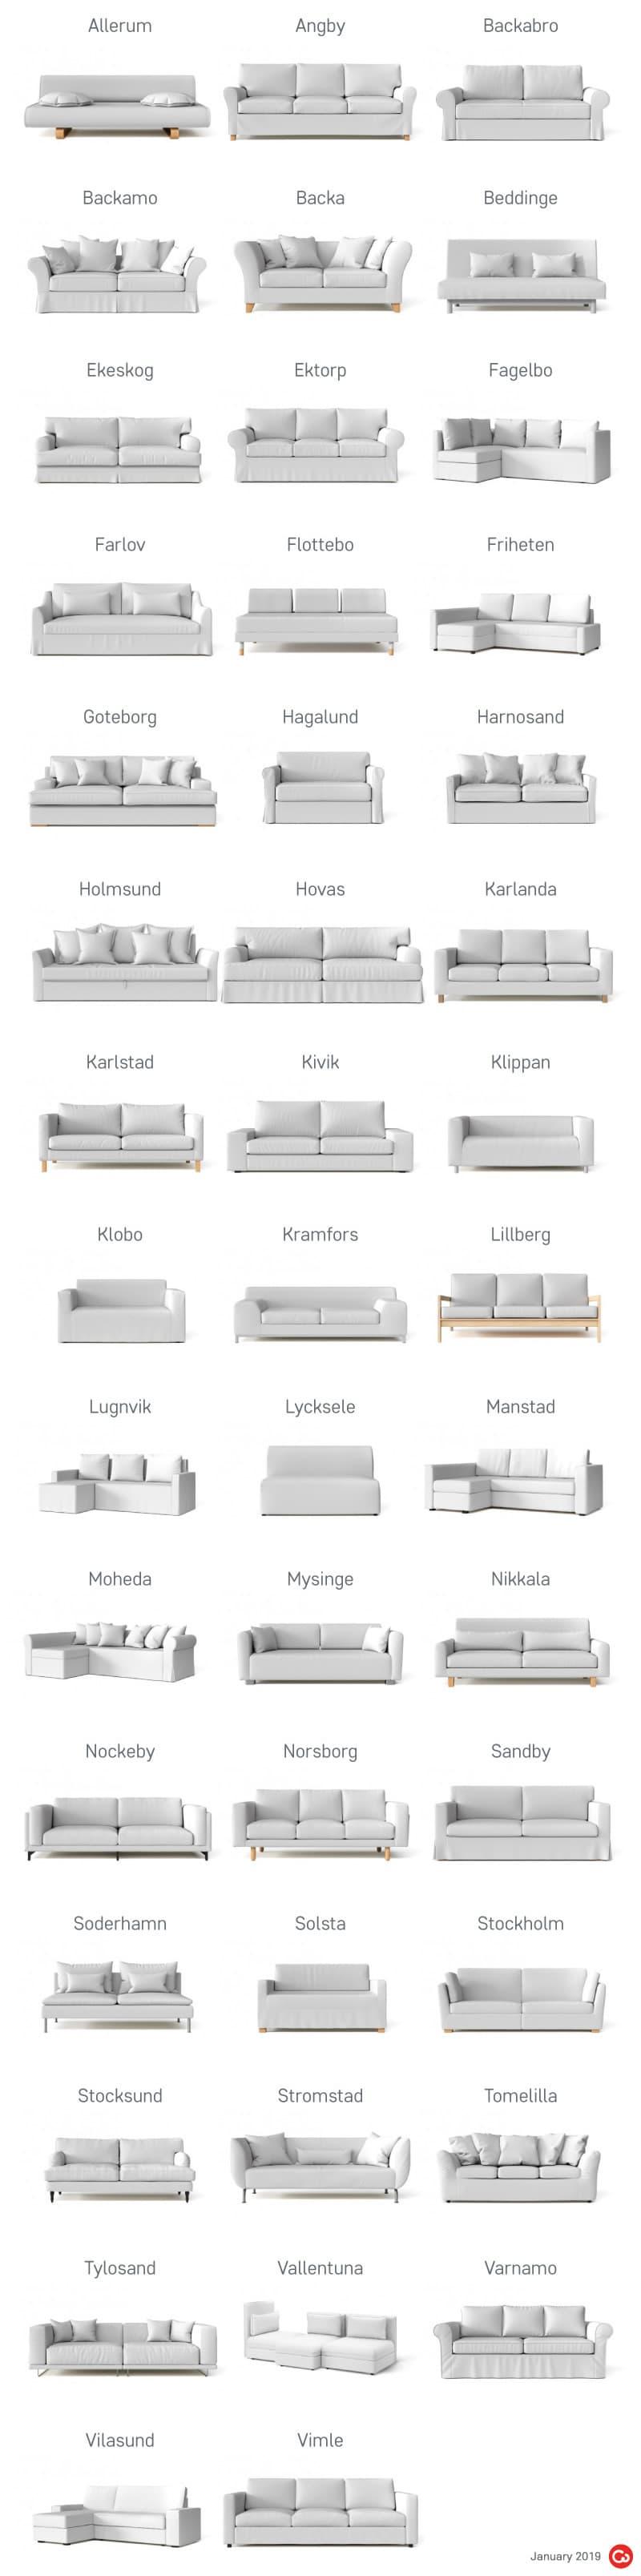 IKEA Discontinued Sofas